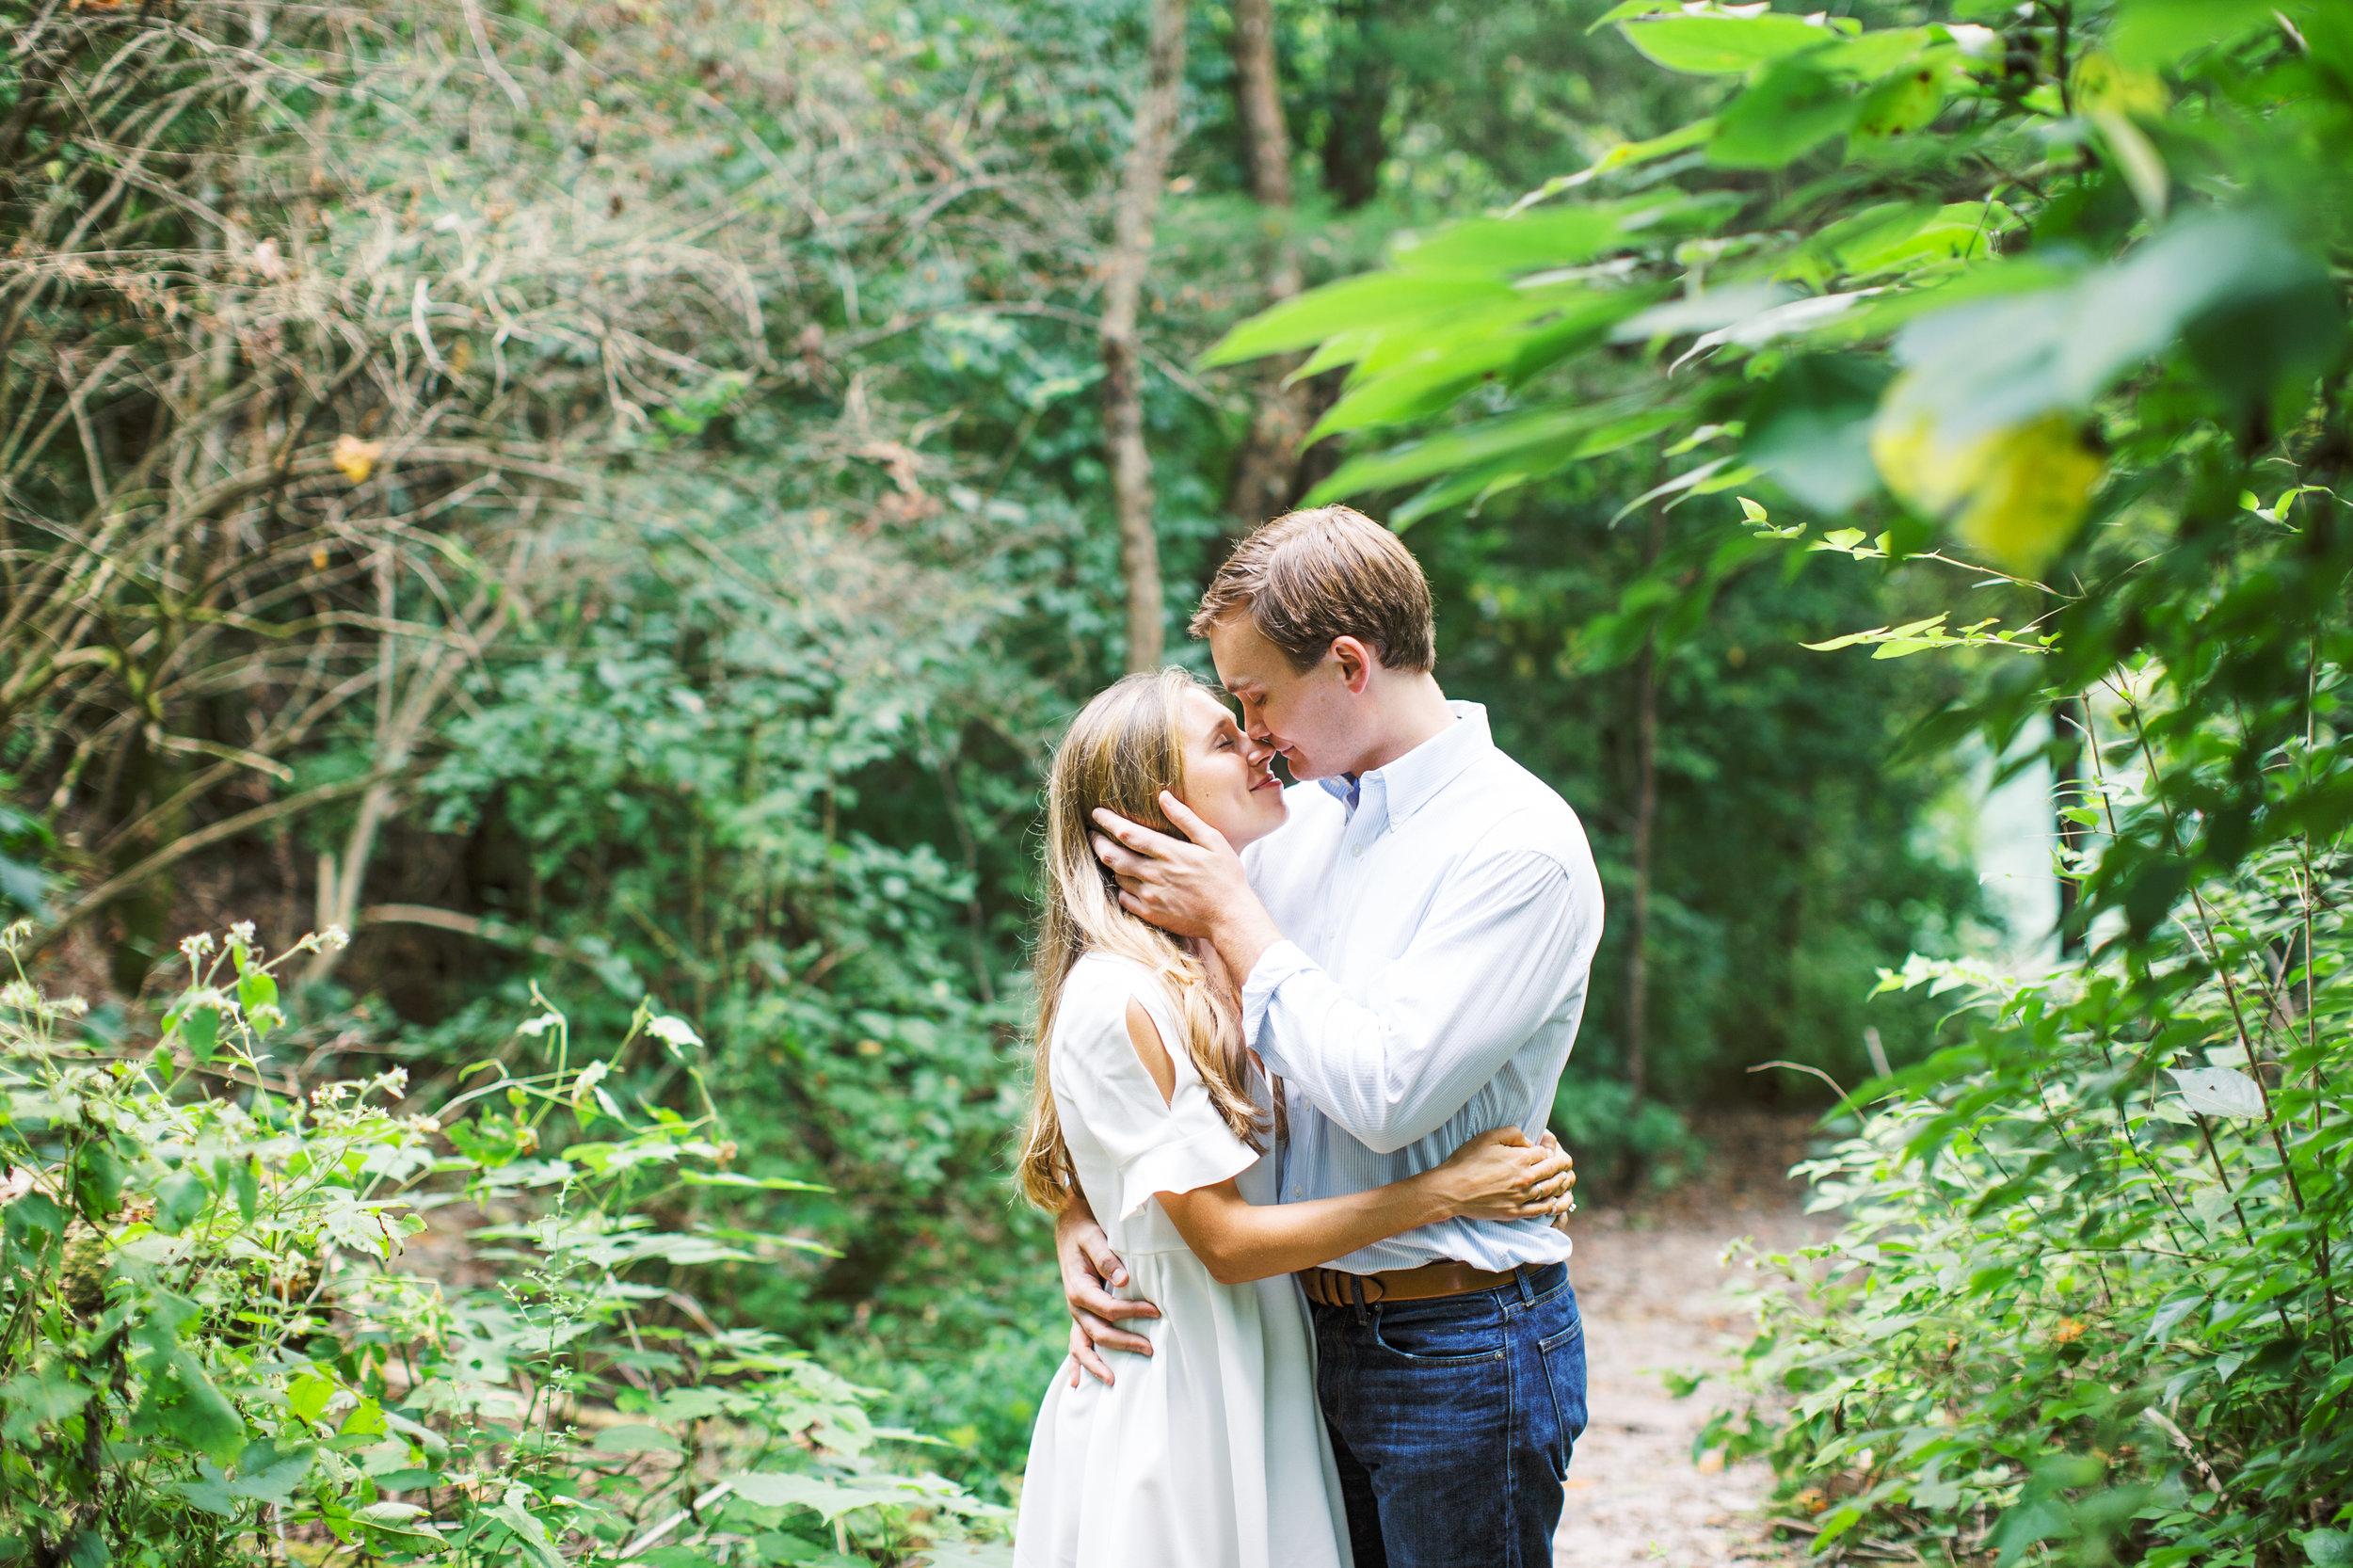 Olivia_Patrick_Engagement_Abigail_Malone_Photography-61.jpg